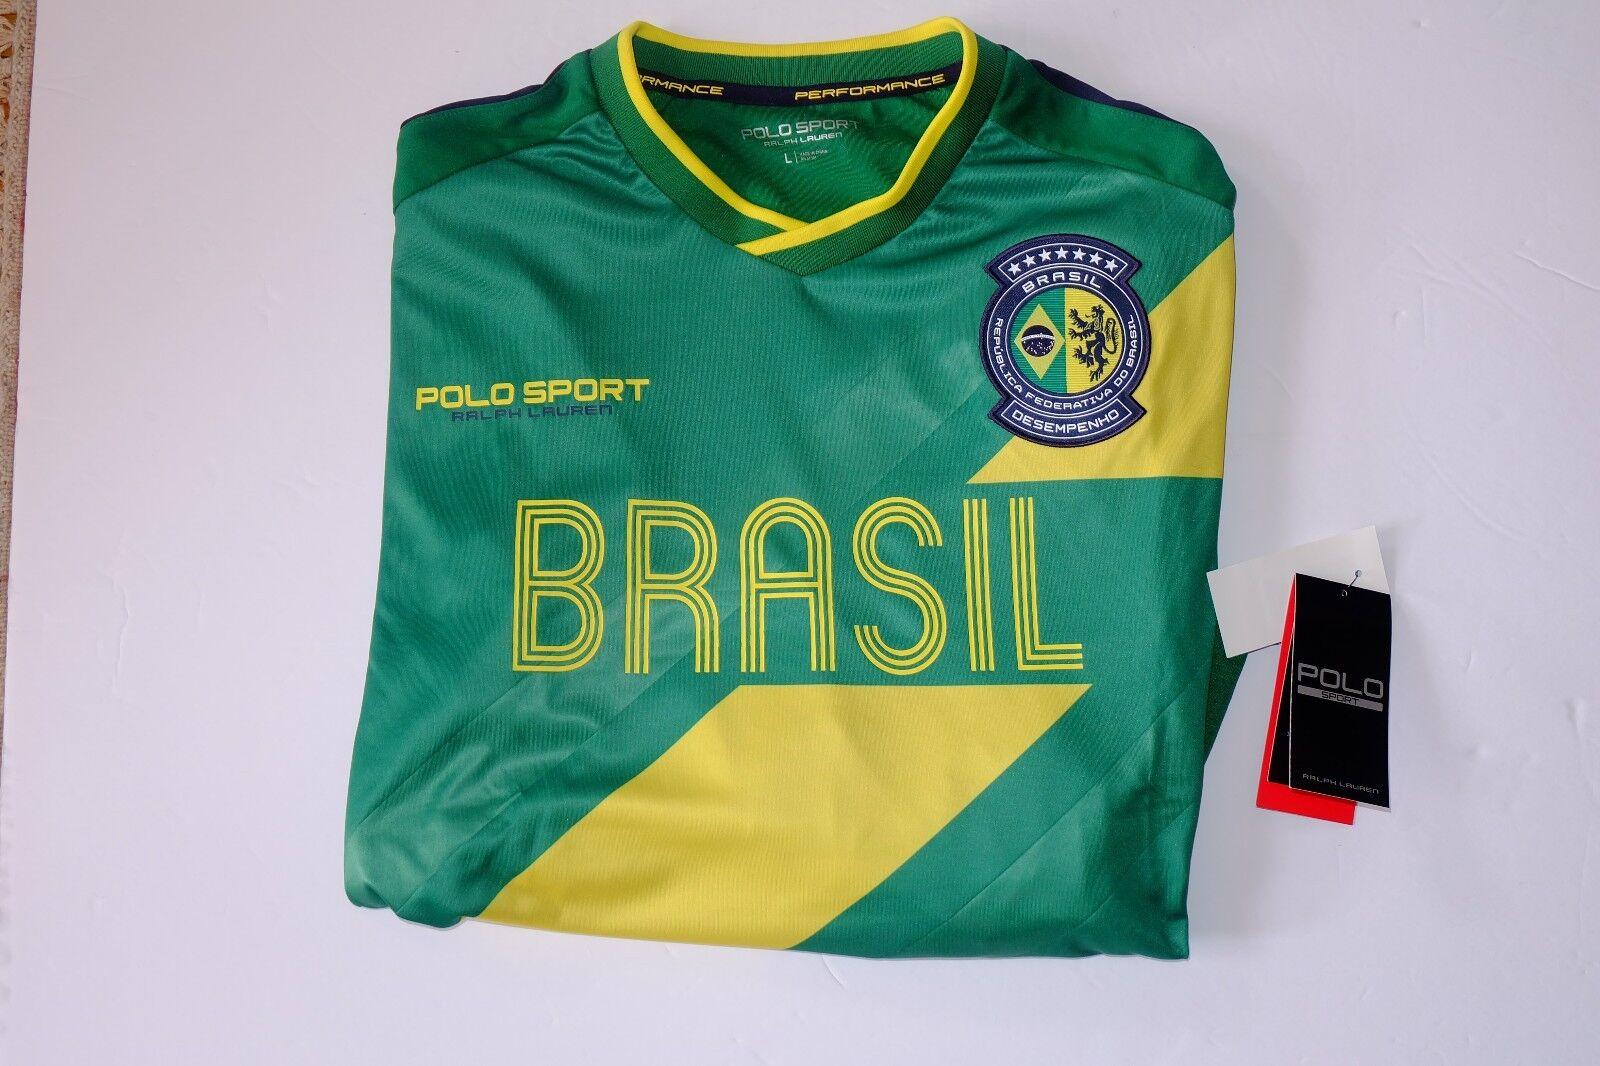 NWT AUTHENTIC Ralph Lauren Polo Sport Brazil Long-Sleeved Jersey T-Shirt